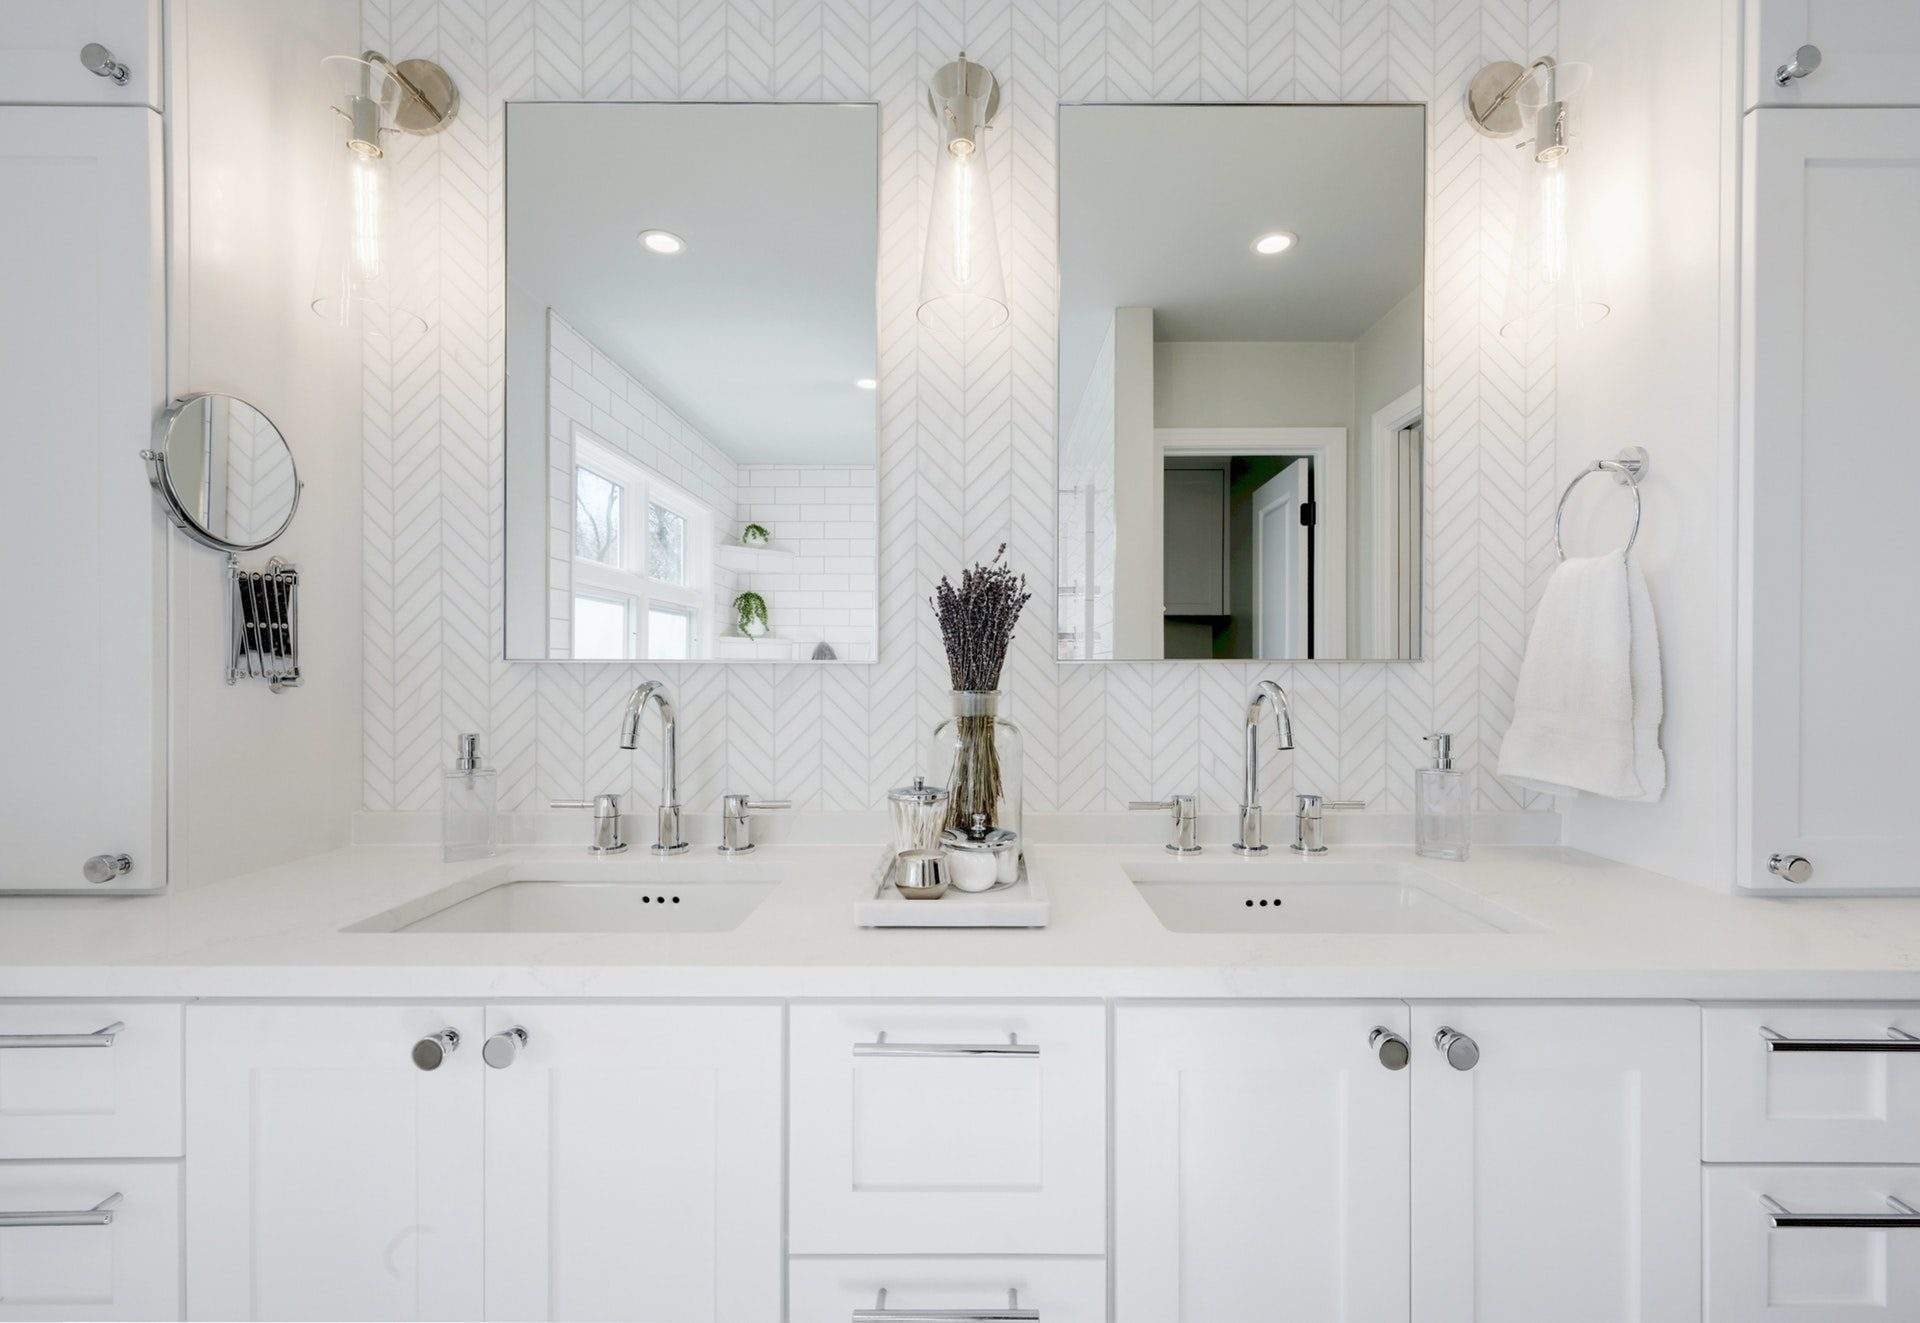 Allandale - interior design Austin | a master bathroom redesign with a white color palette in the Allandale neighborhood in Austin, Texas | austin, texas